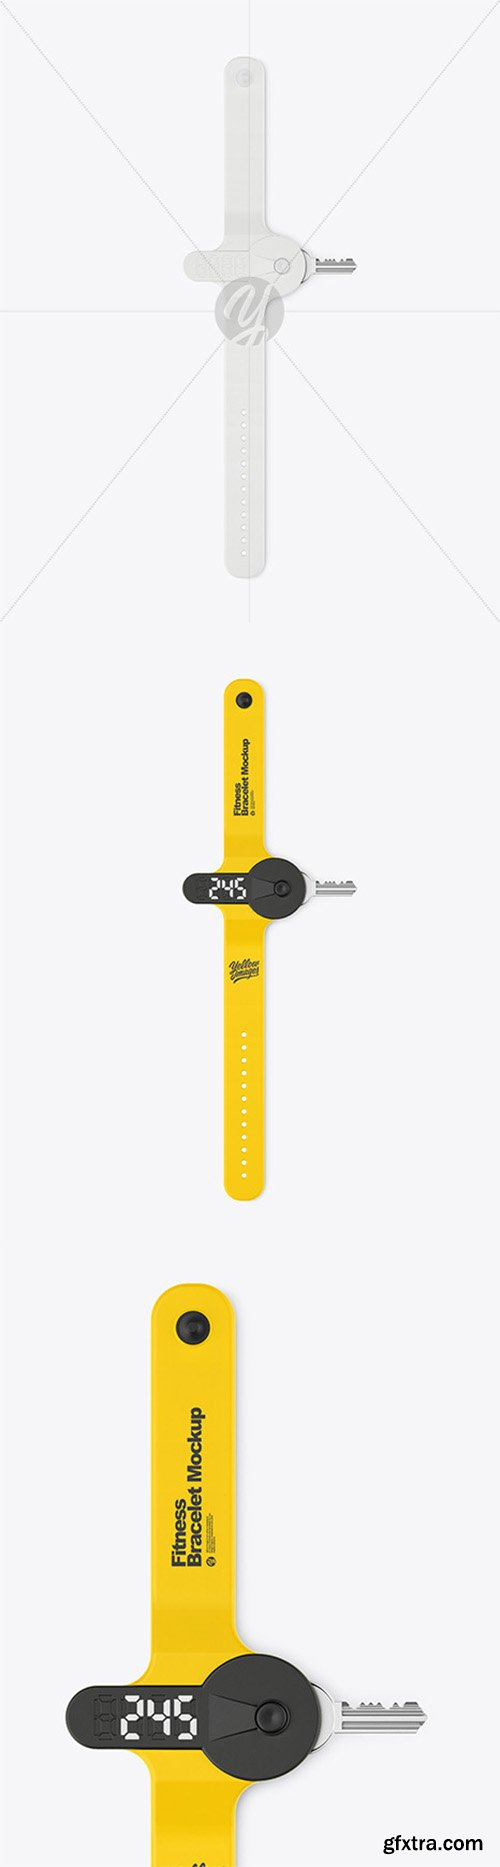 Fitness Silicone Bracelet Mockup 80884